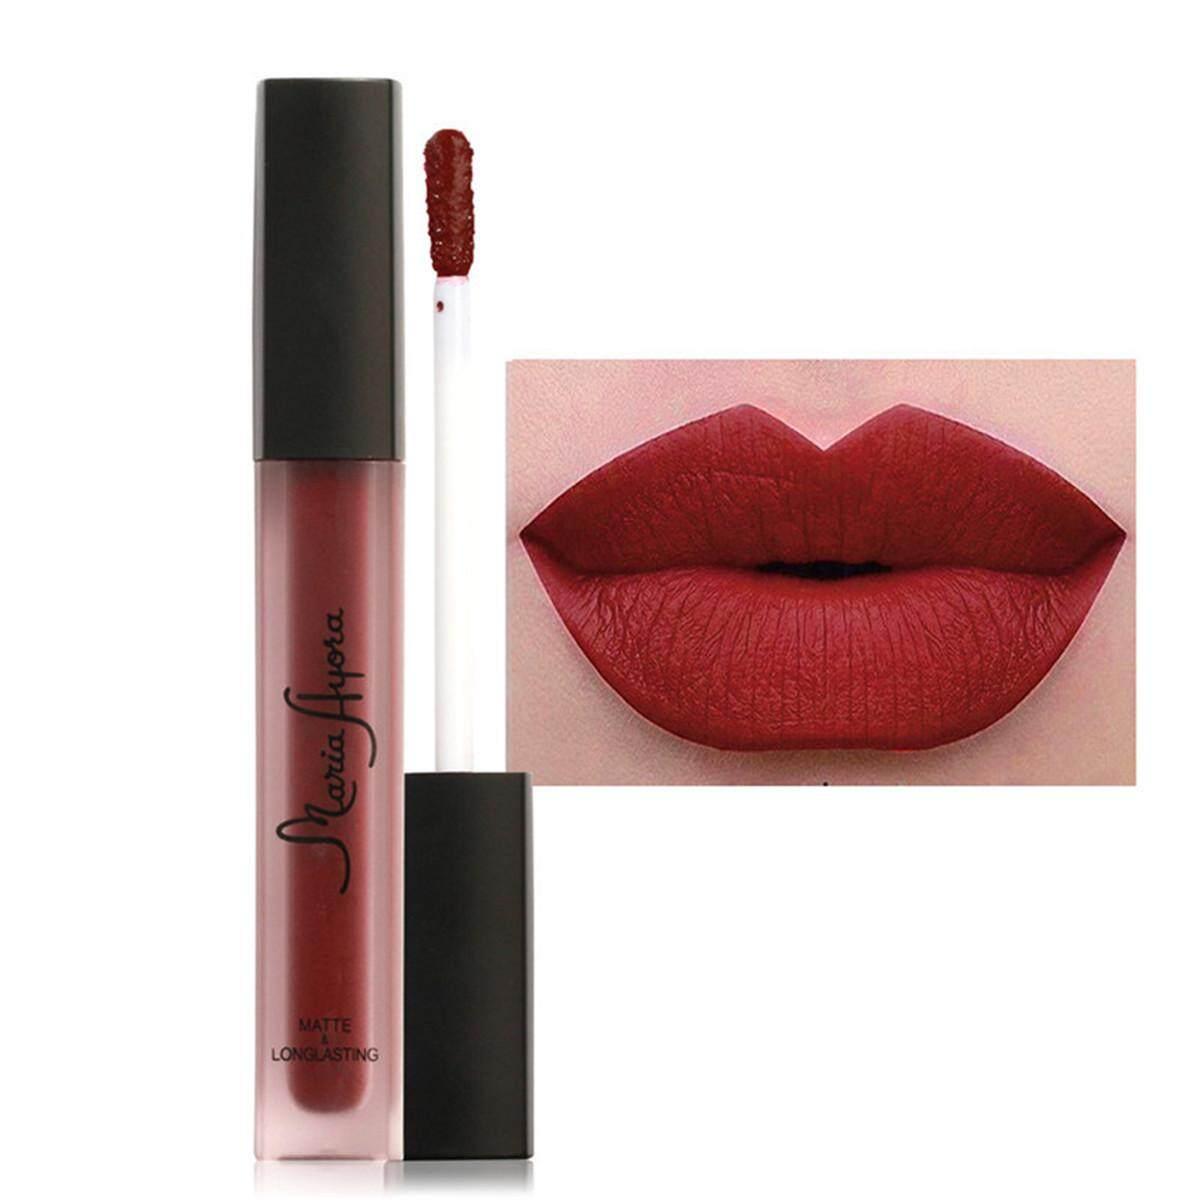 10 Tint Lip Gloss Matte Sexy Liquid Lipstick Waterproof Long Lasting Clear Lipgloss Cosmetic Beauty Lip Tattoo Make Up Tools